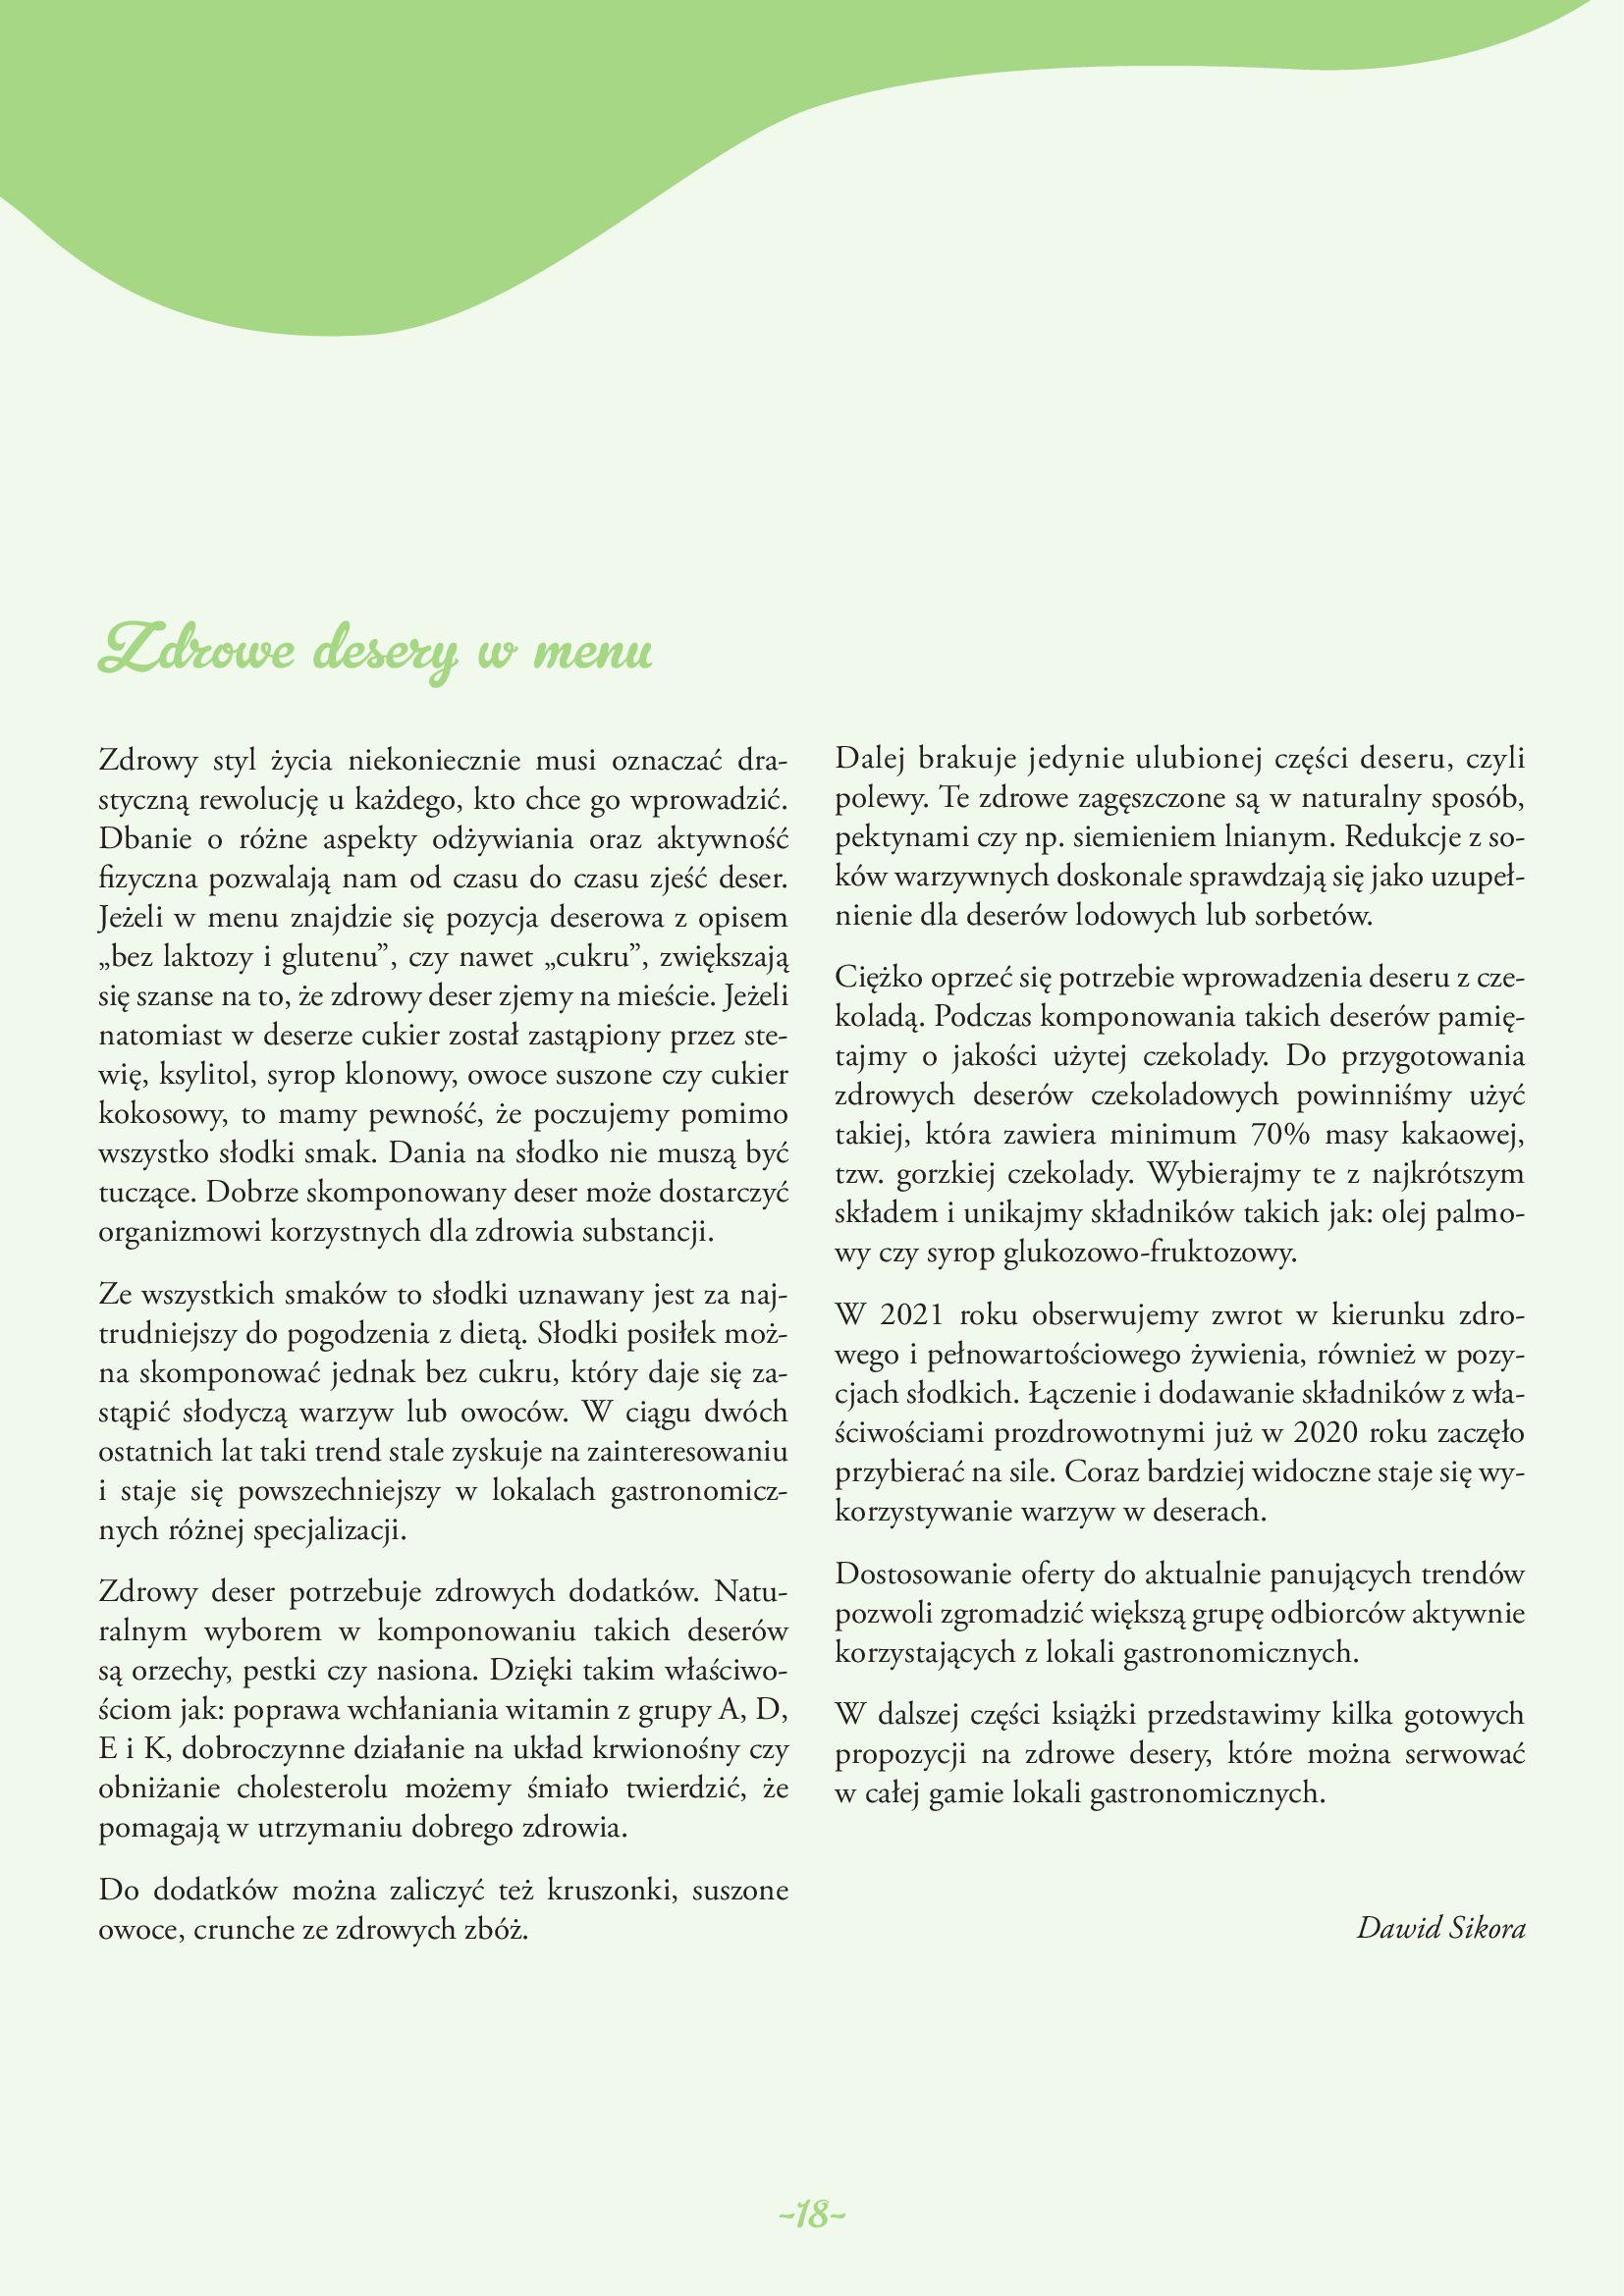 Gazetka Makro: Gazetka Makro - lody i desery 2021-05-21 page-18